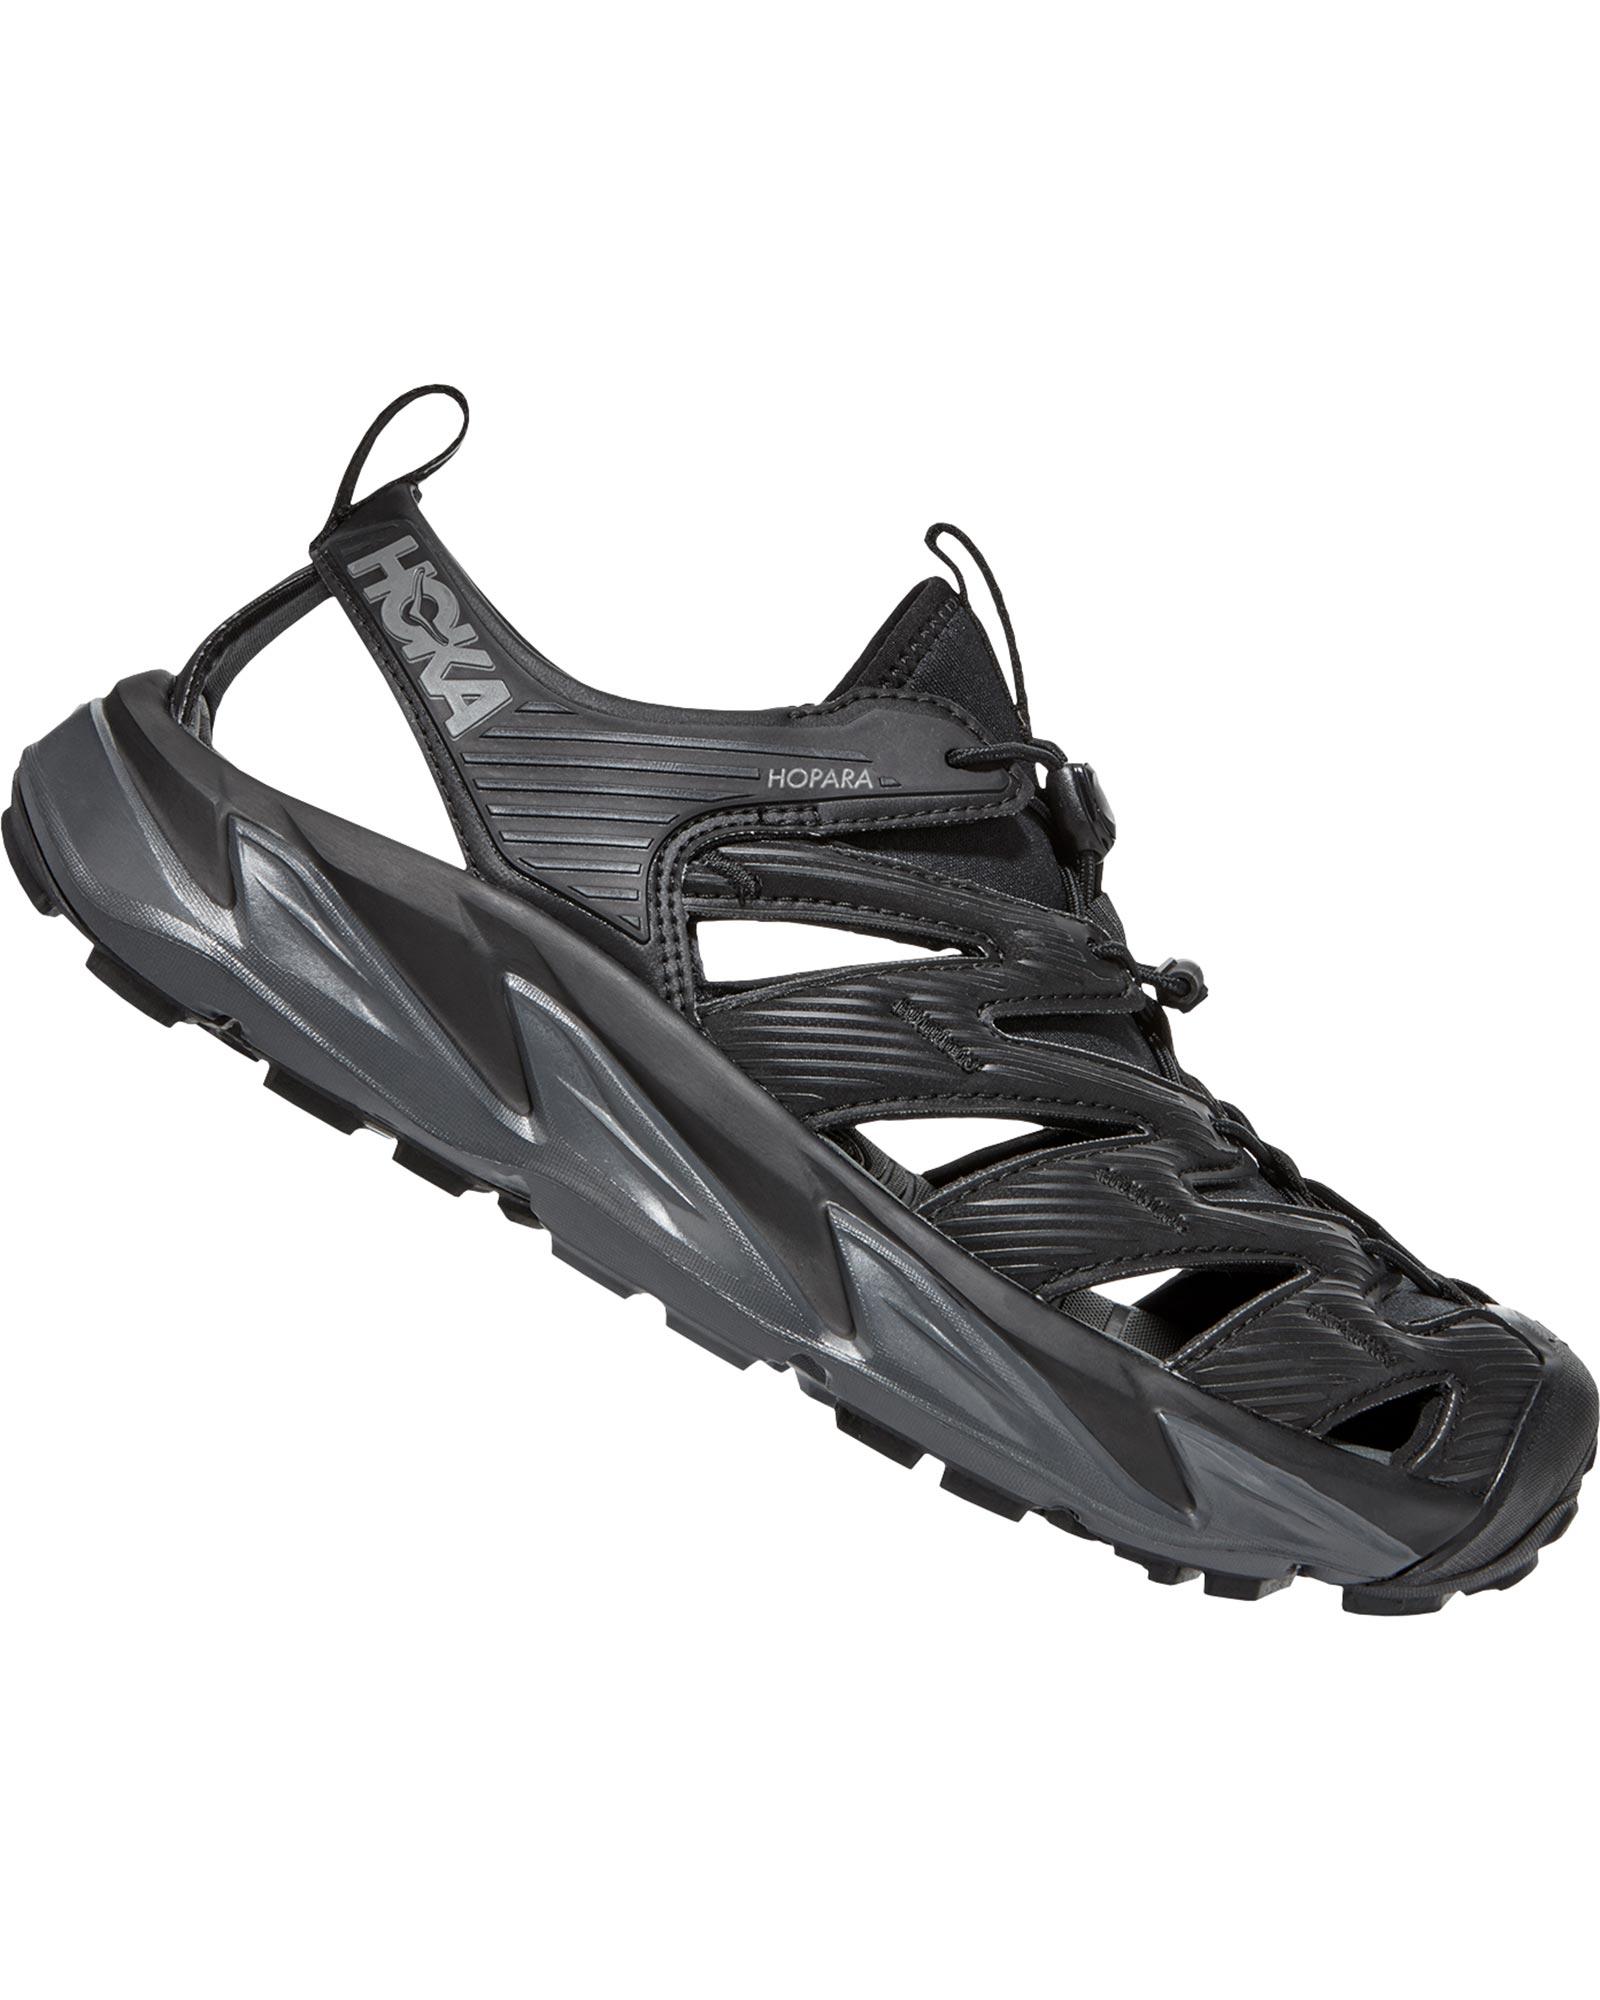 Hoka One One Hopara Men's Sandals 0